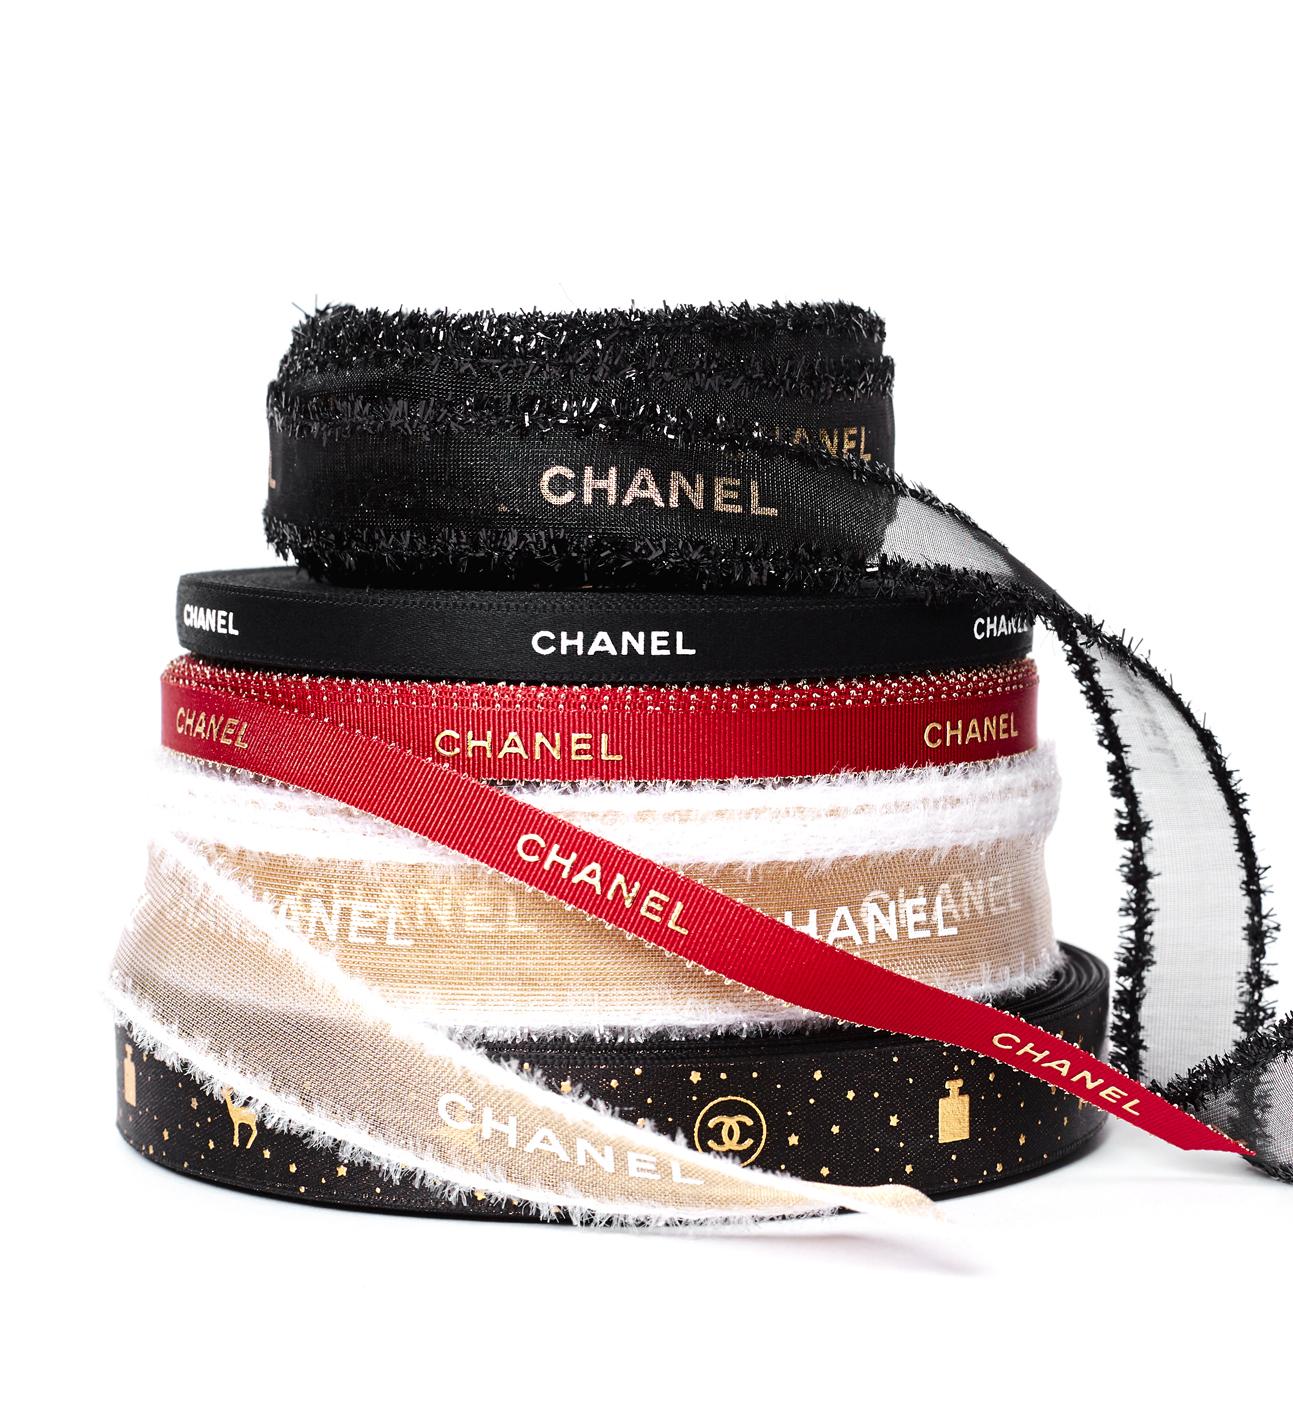 Chanel Ribbon.jpg